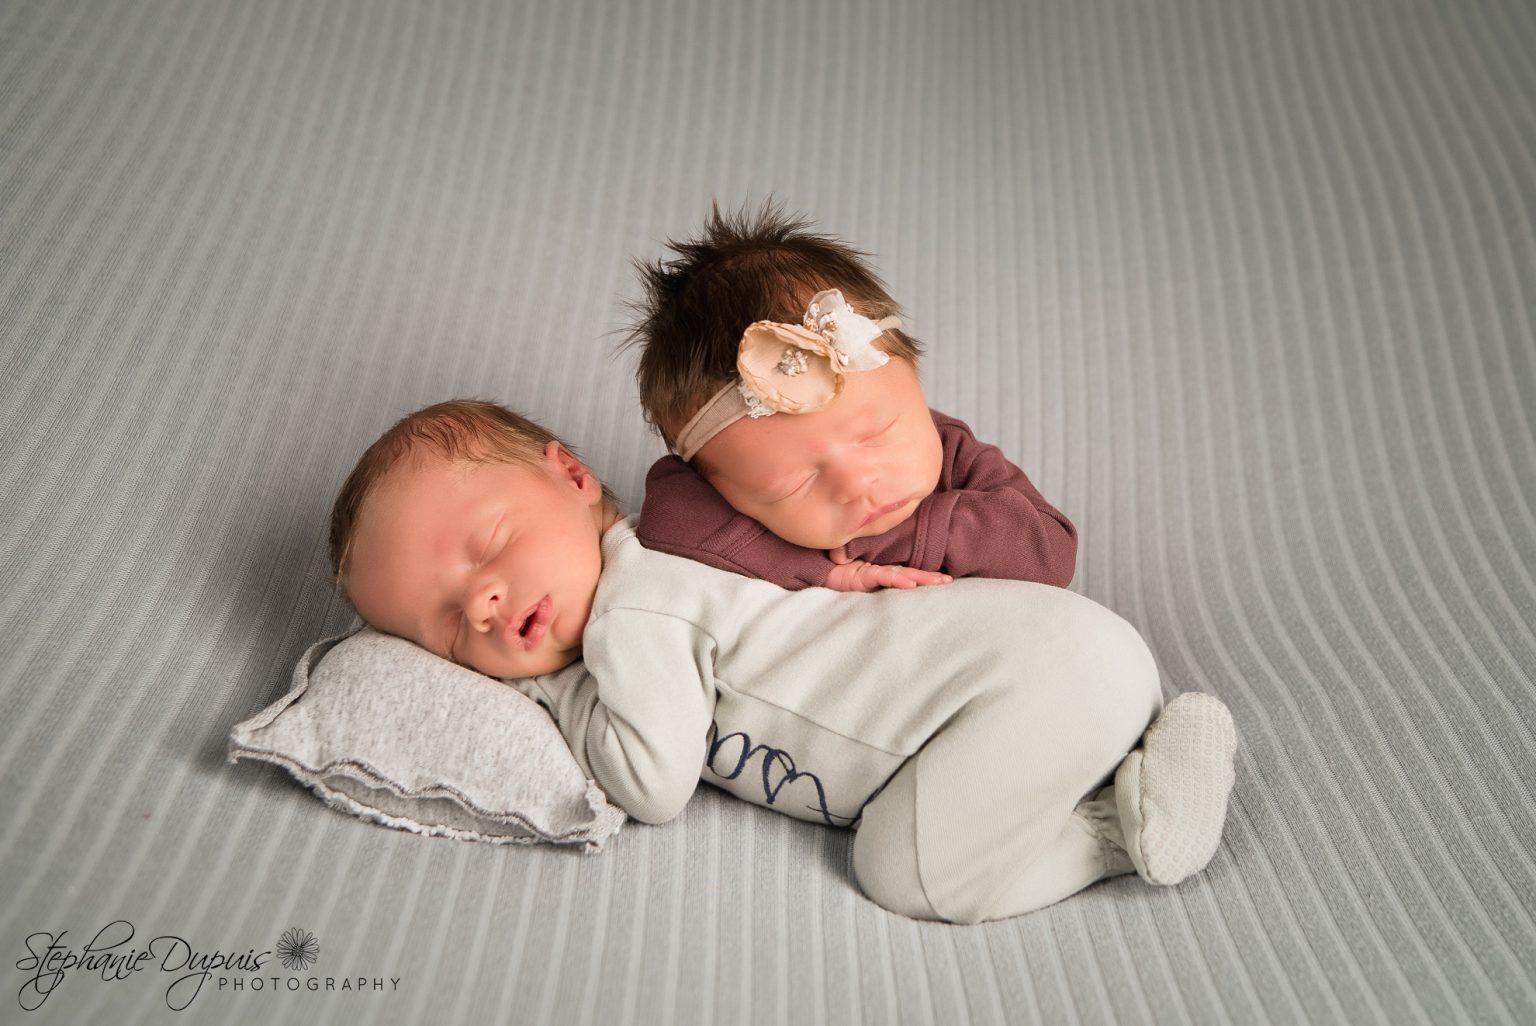 Lena and Asa 14 1536x1026 - Portfolio: Lena & Asa Newborn Session